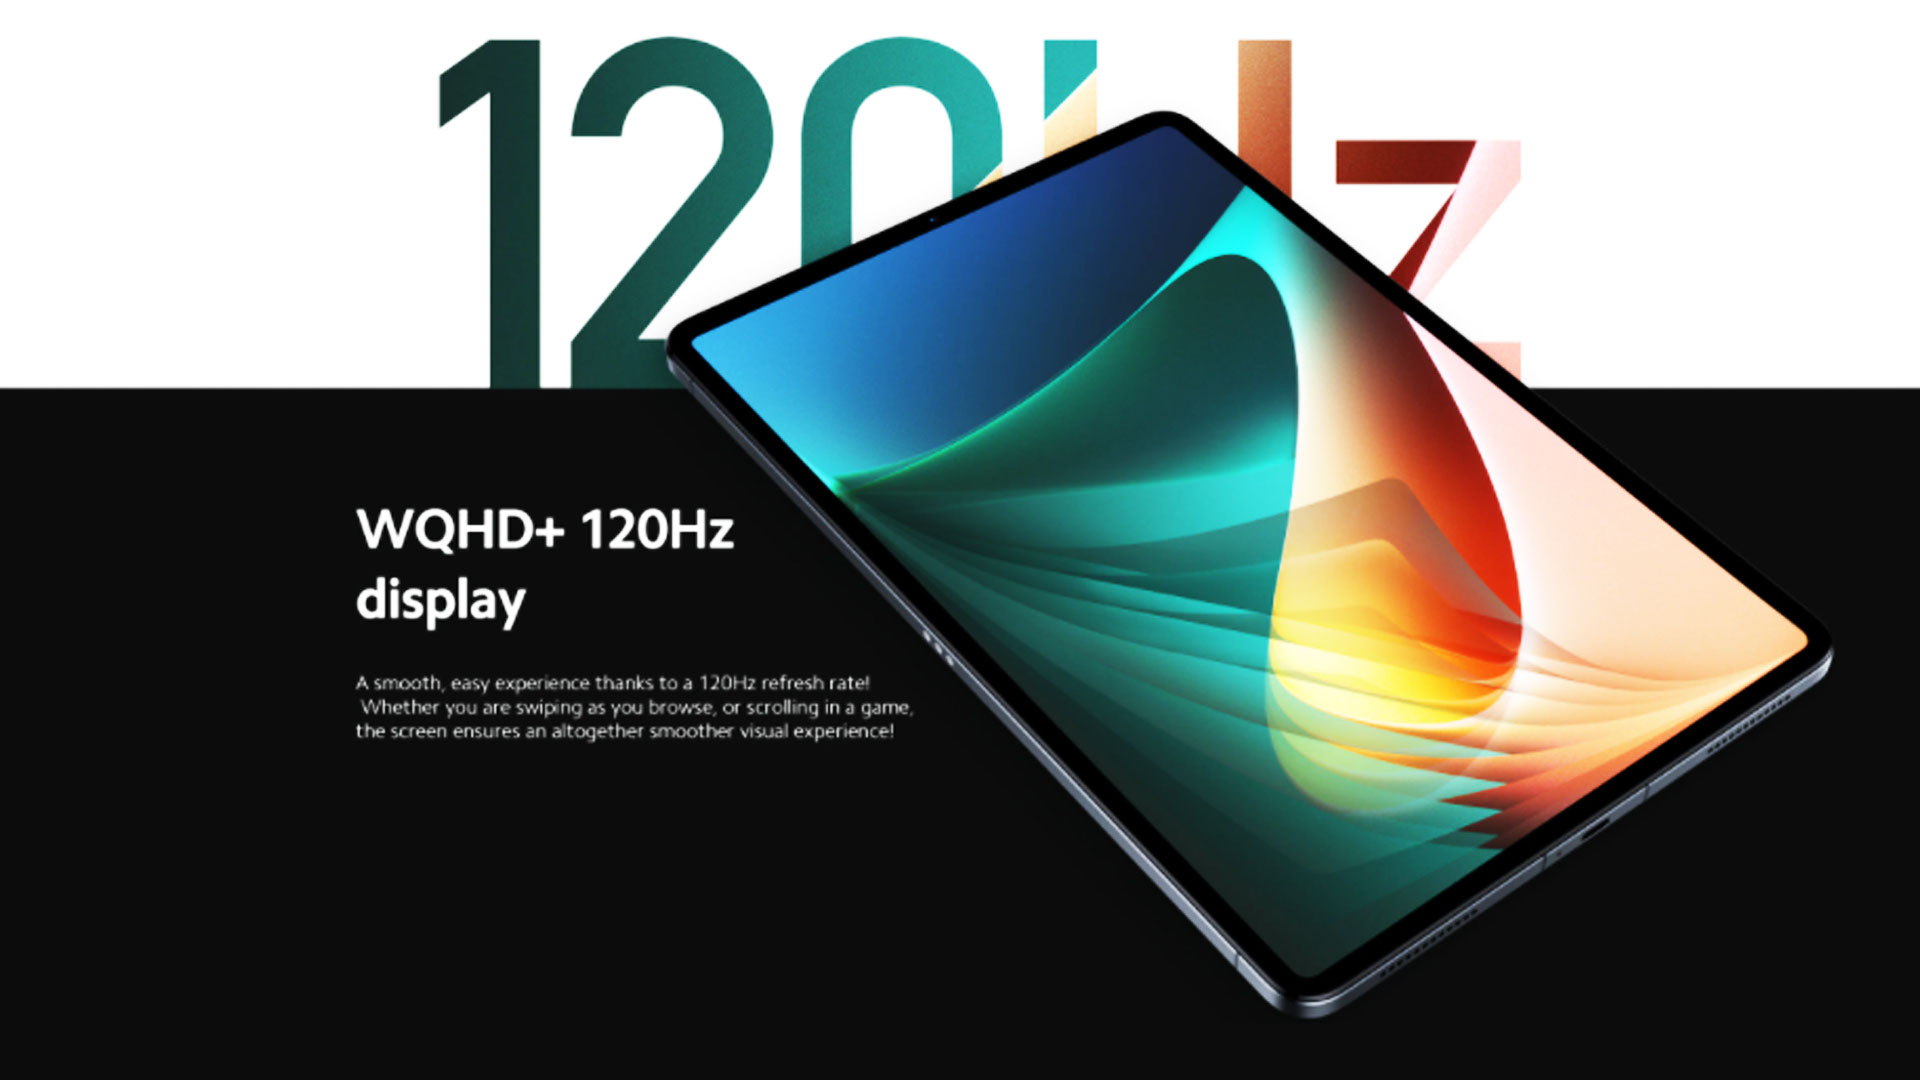 Mi Pad 5 Xiaomi mi pad 5 Xiaomi tablet tablet Android tablet